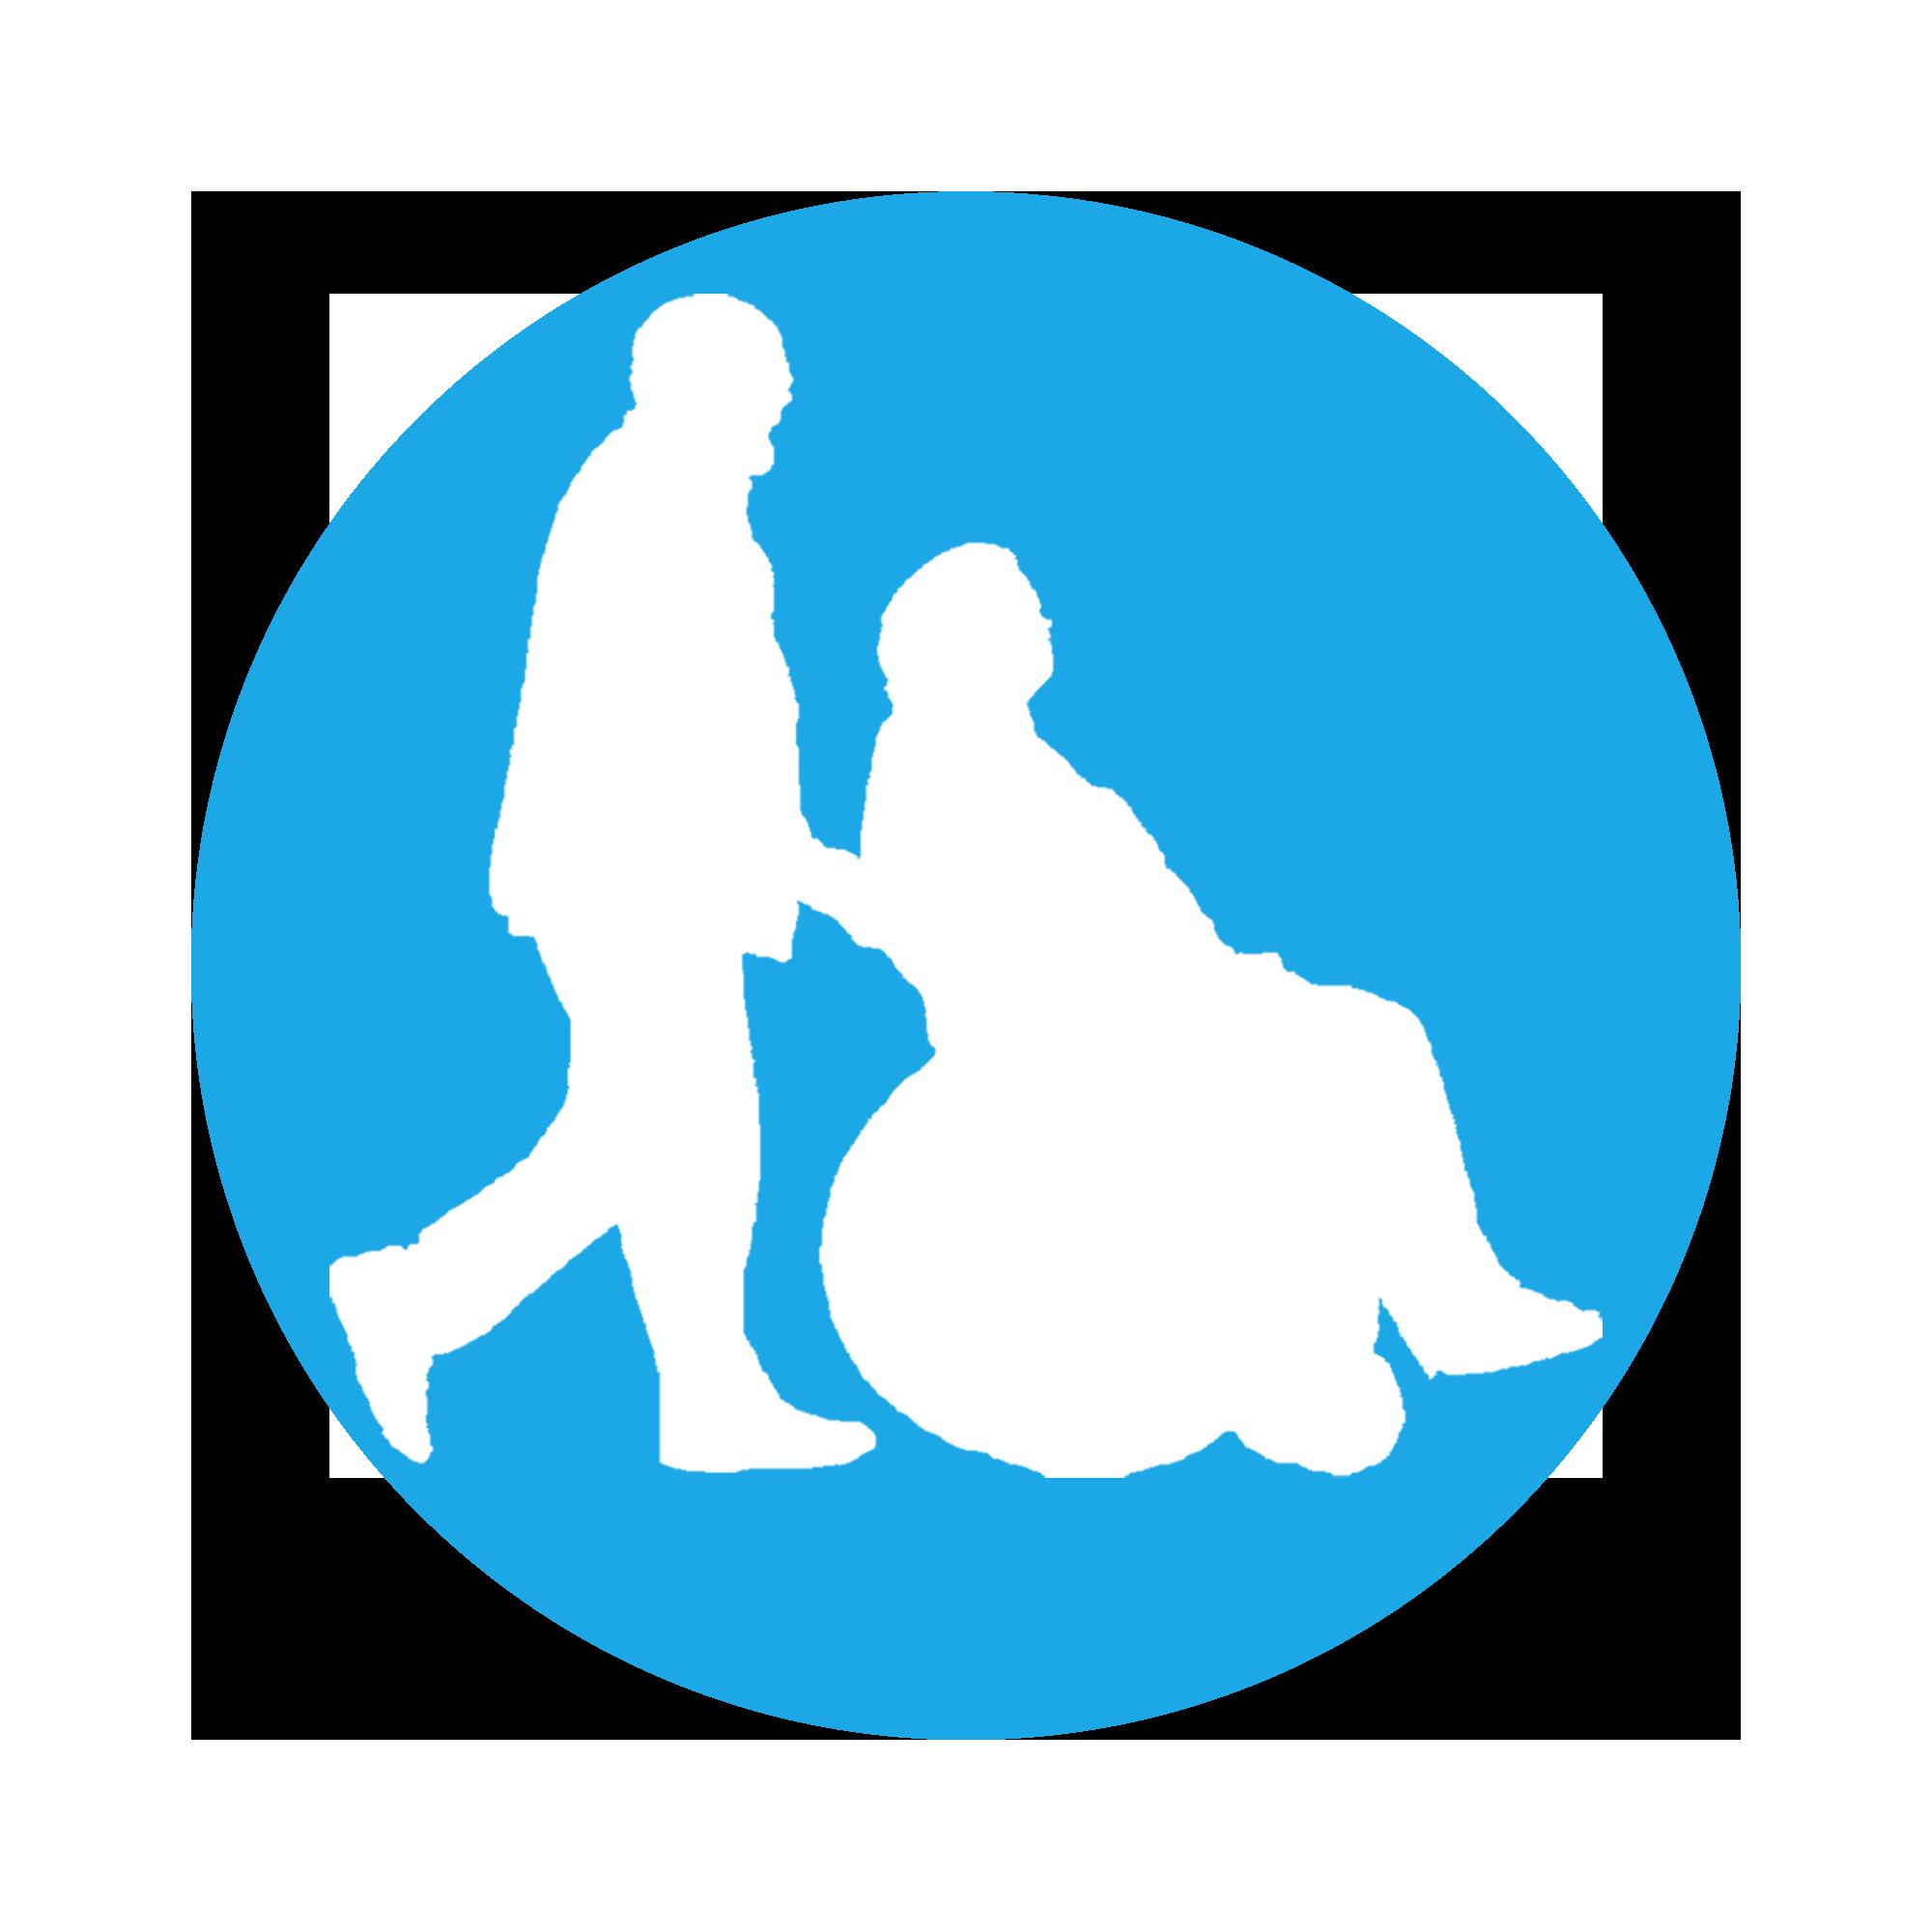 senior caregiver a111lliance logo_edited-1